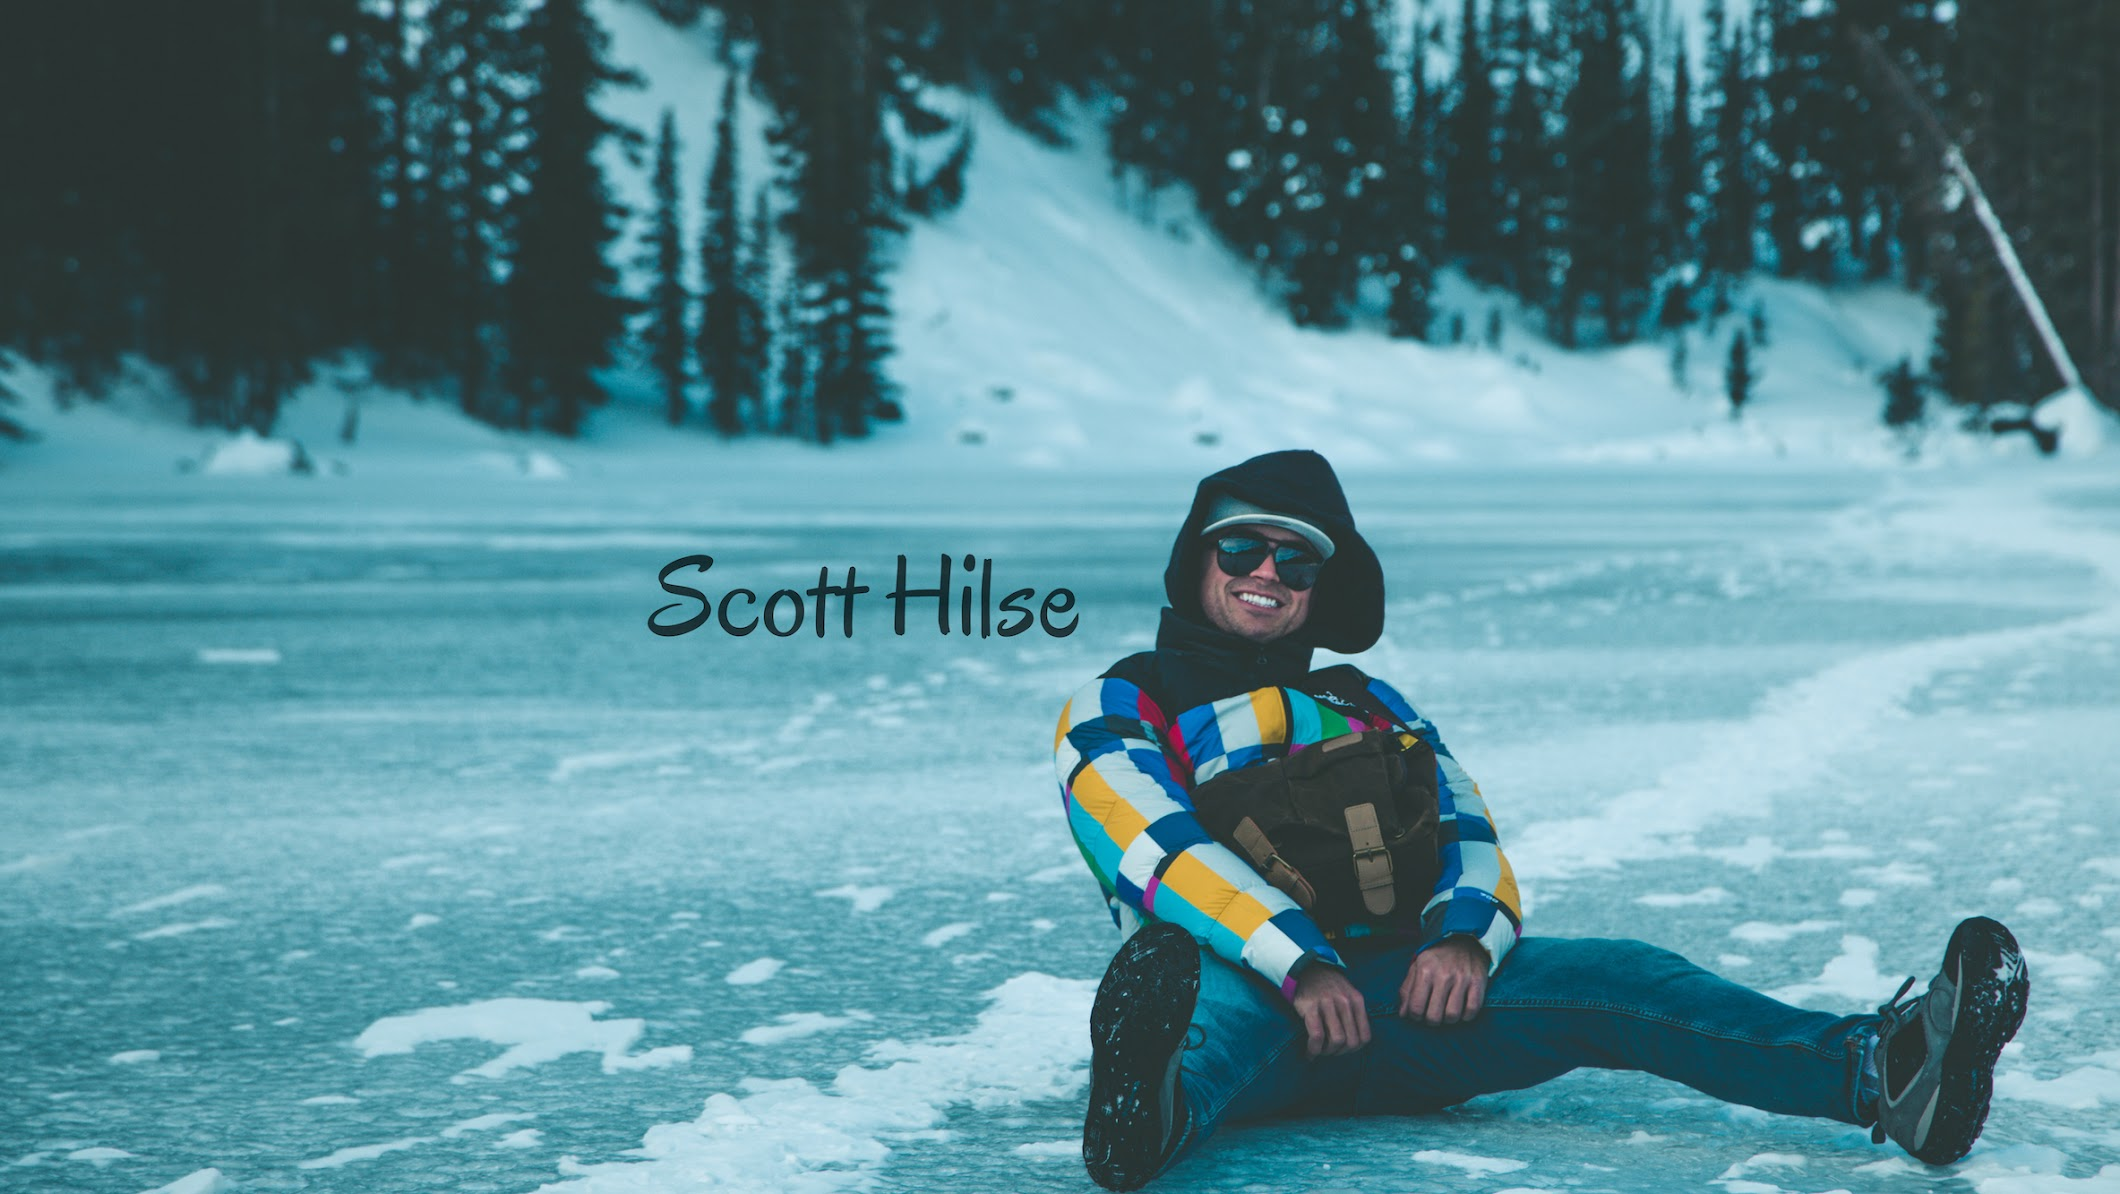 Scott Hilse- eCommerce Youtube Channels 2021